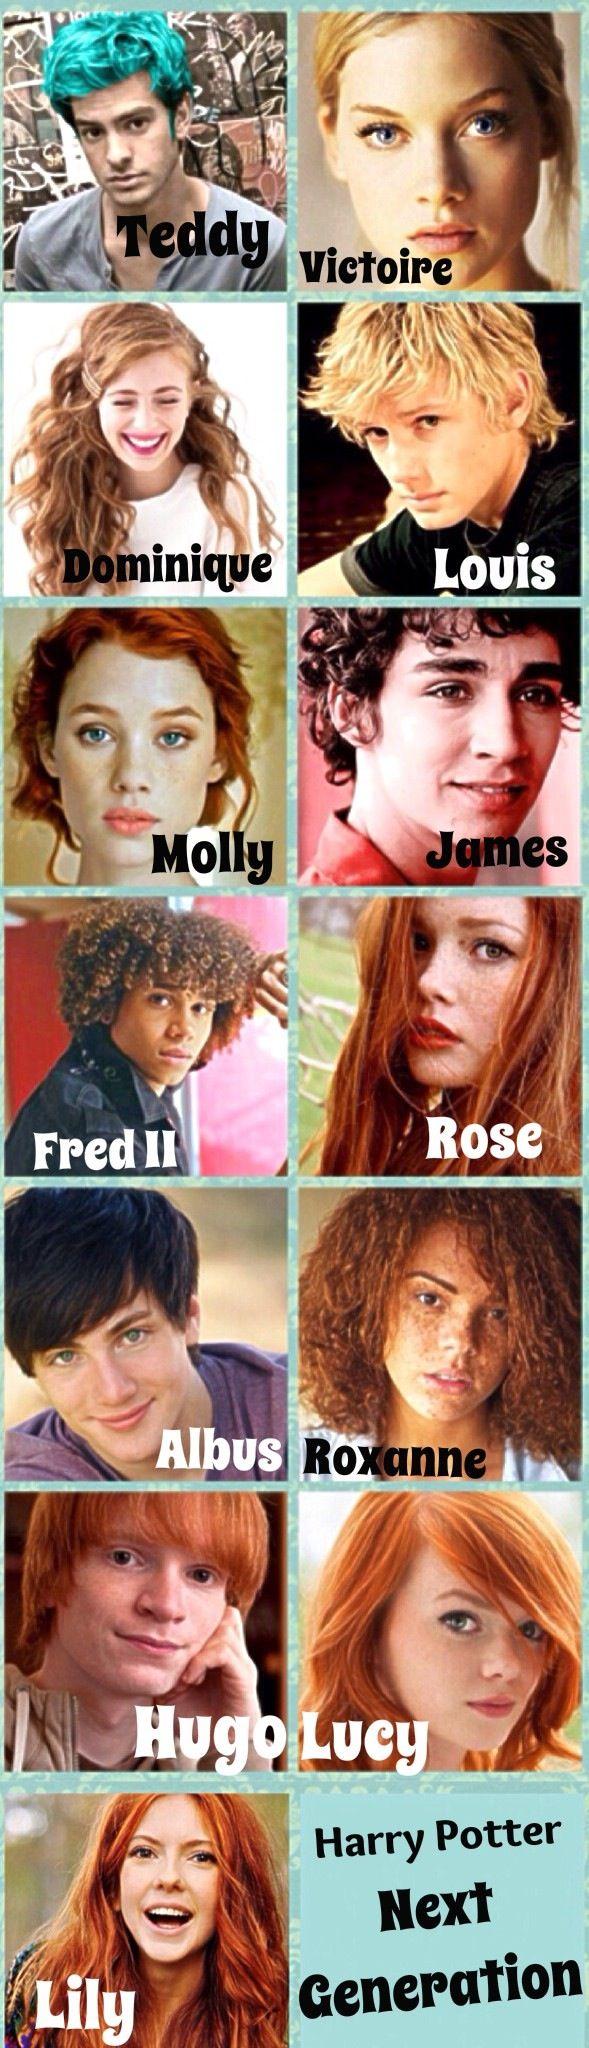 Harry Potter Next Generation! | Next generation | Harry ...